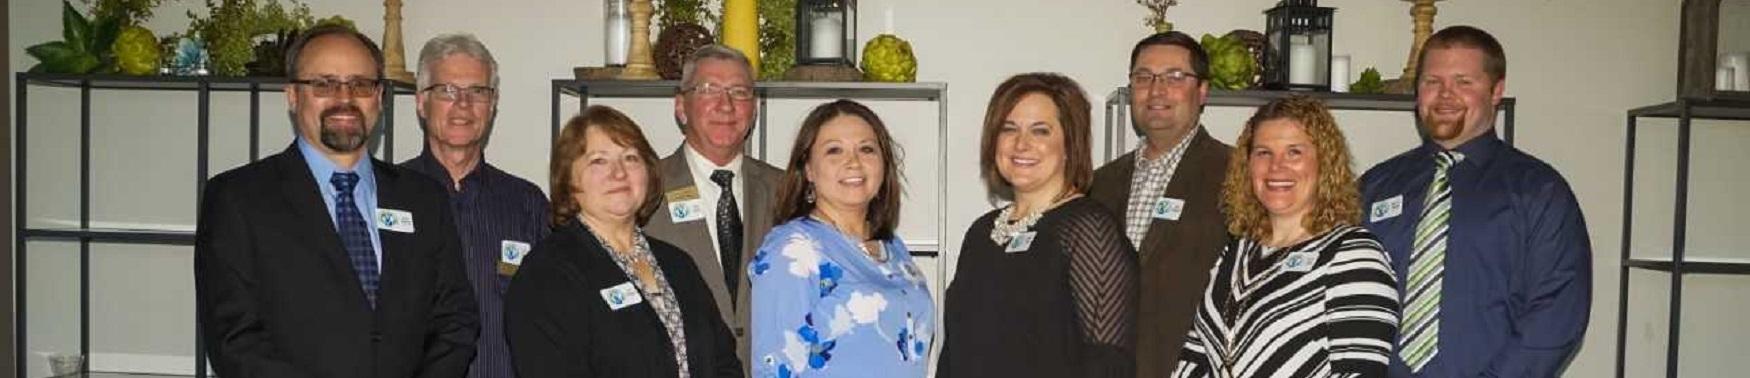 Spring Valley Area Community Foundation Board 2017